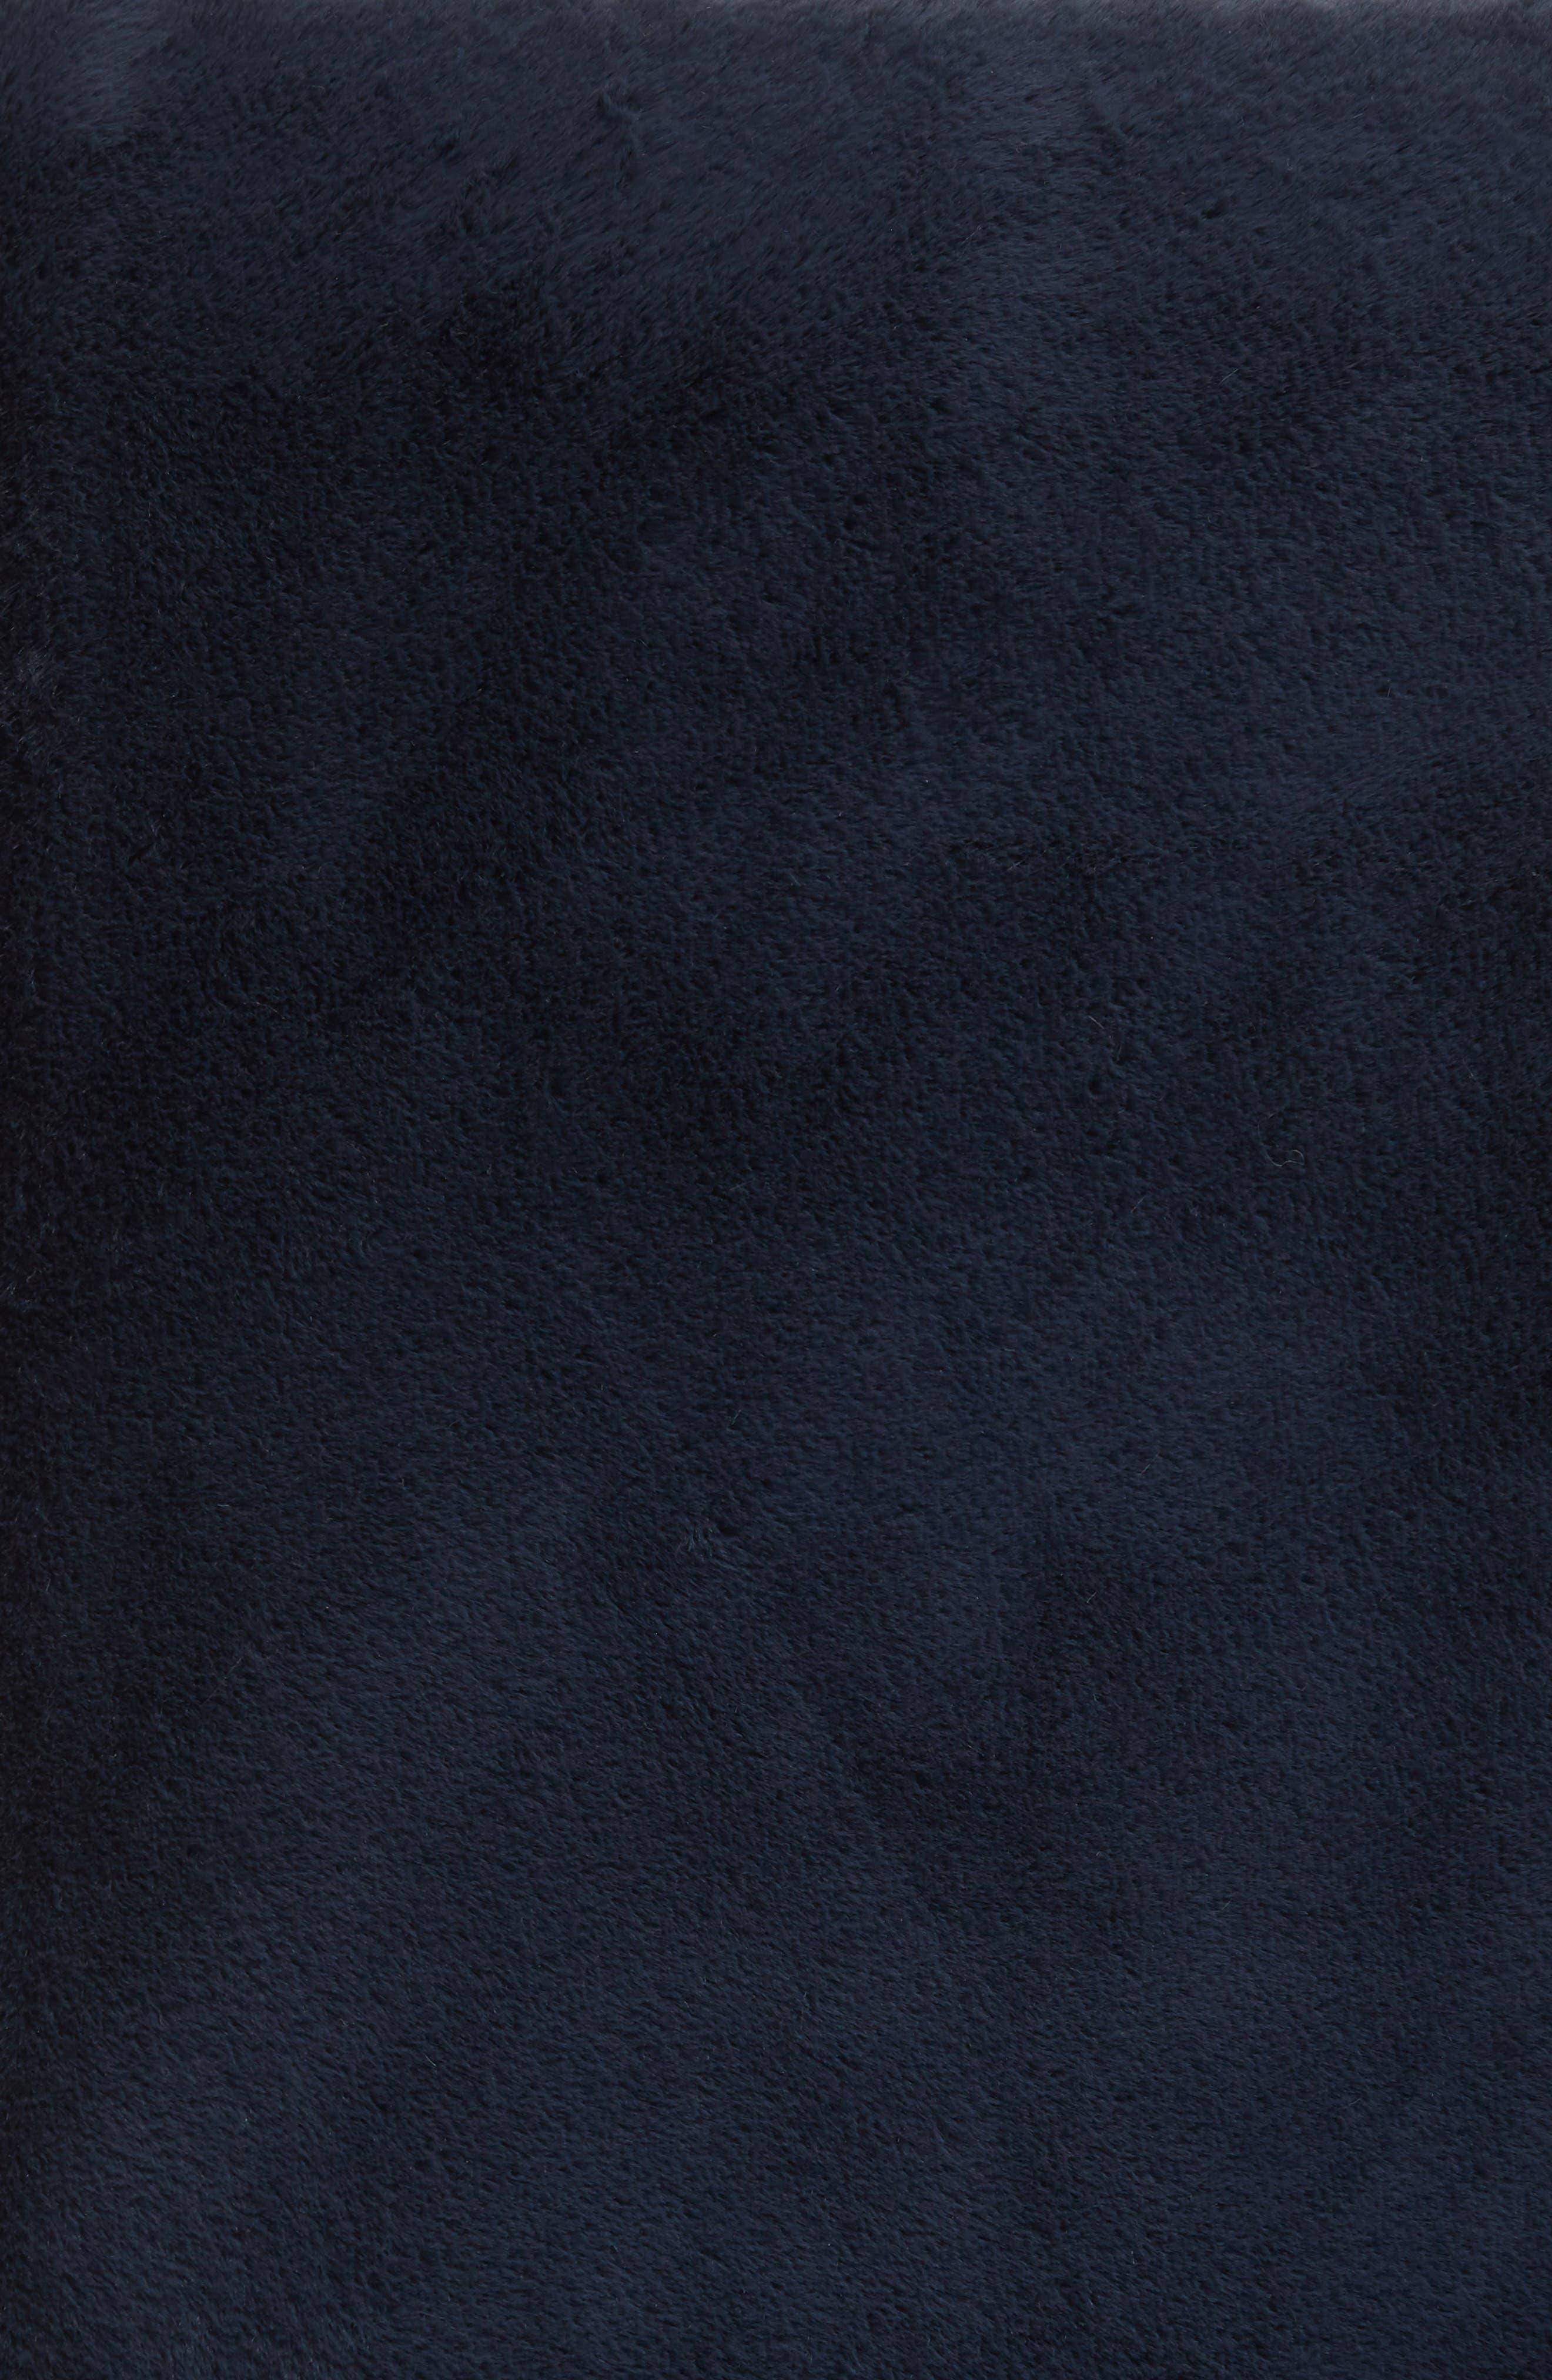 NORDSTROM AT HOME, Reversible Plush Throw Blanket, Alternate thumbnail 2, color, NAVY BLUE